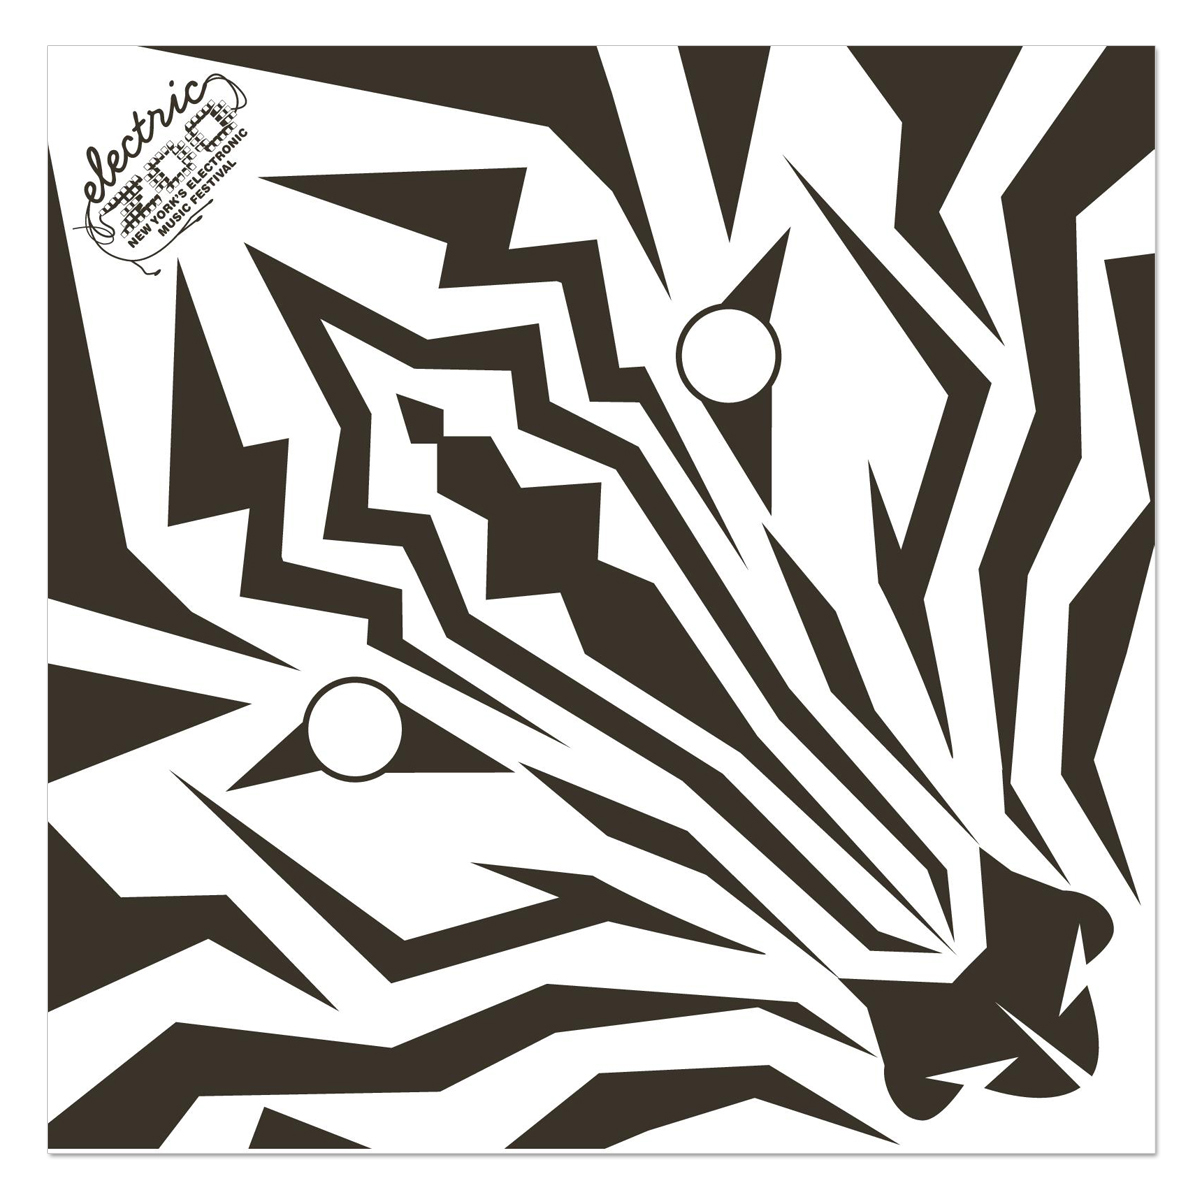 Electric Zoo Zebra Bandana